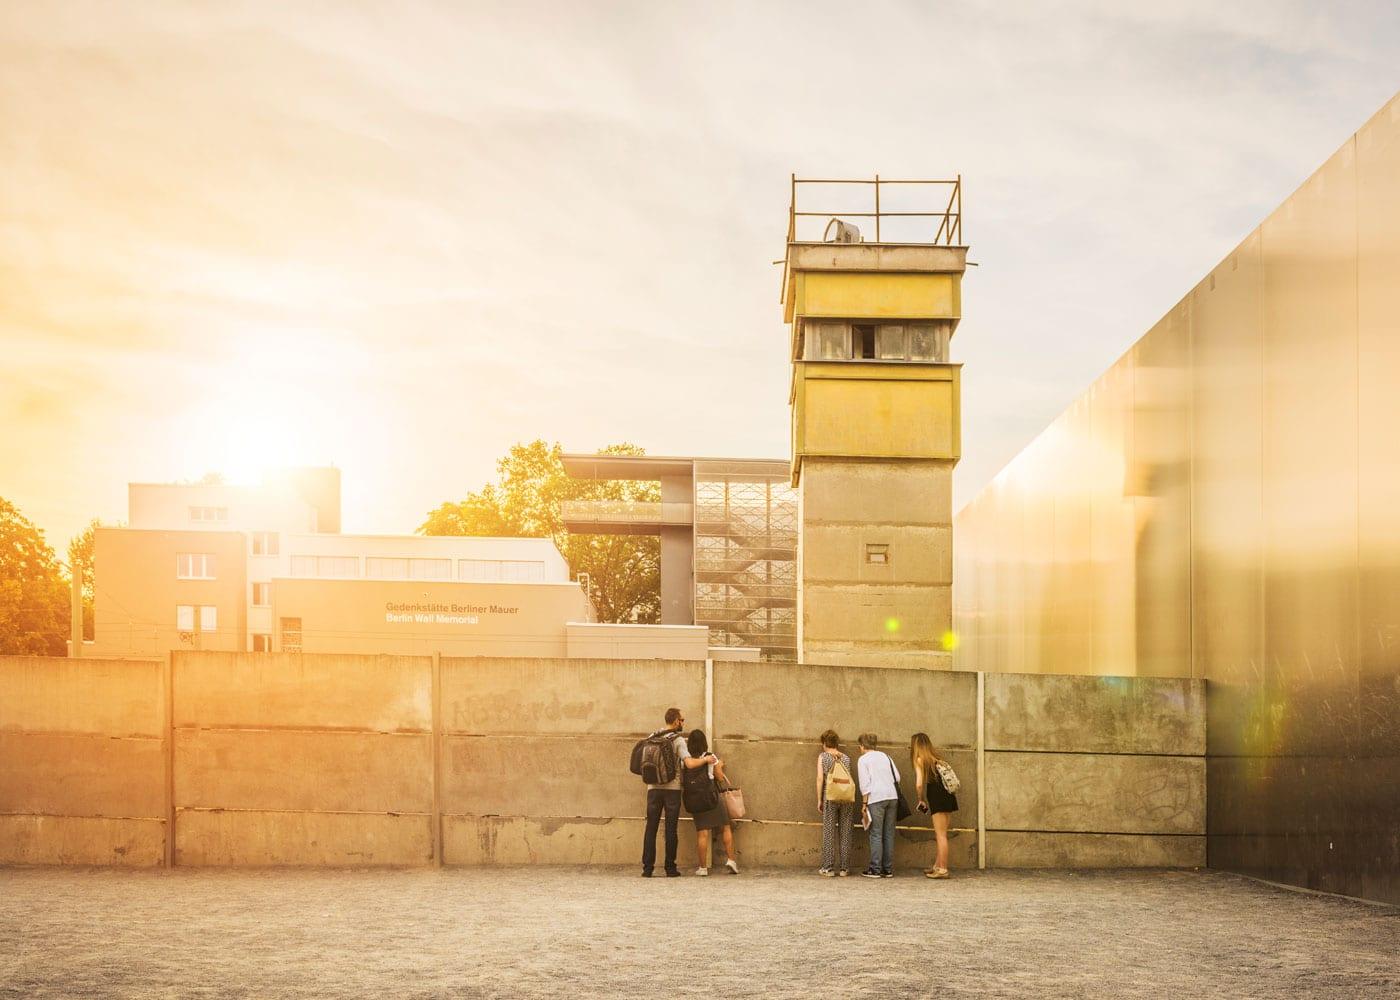 Ausflug in Berlin: Gedänkstätte Berliner Mauer // HIMBEER